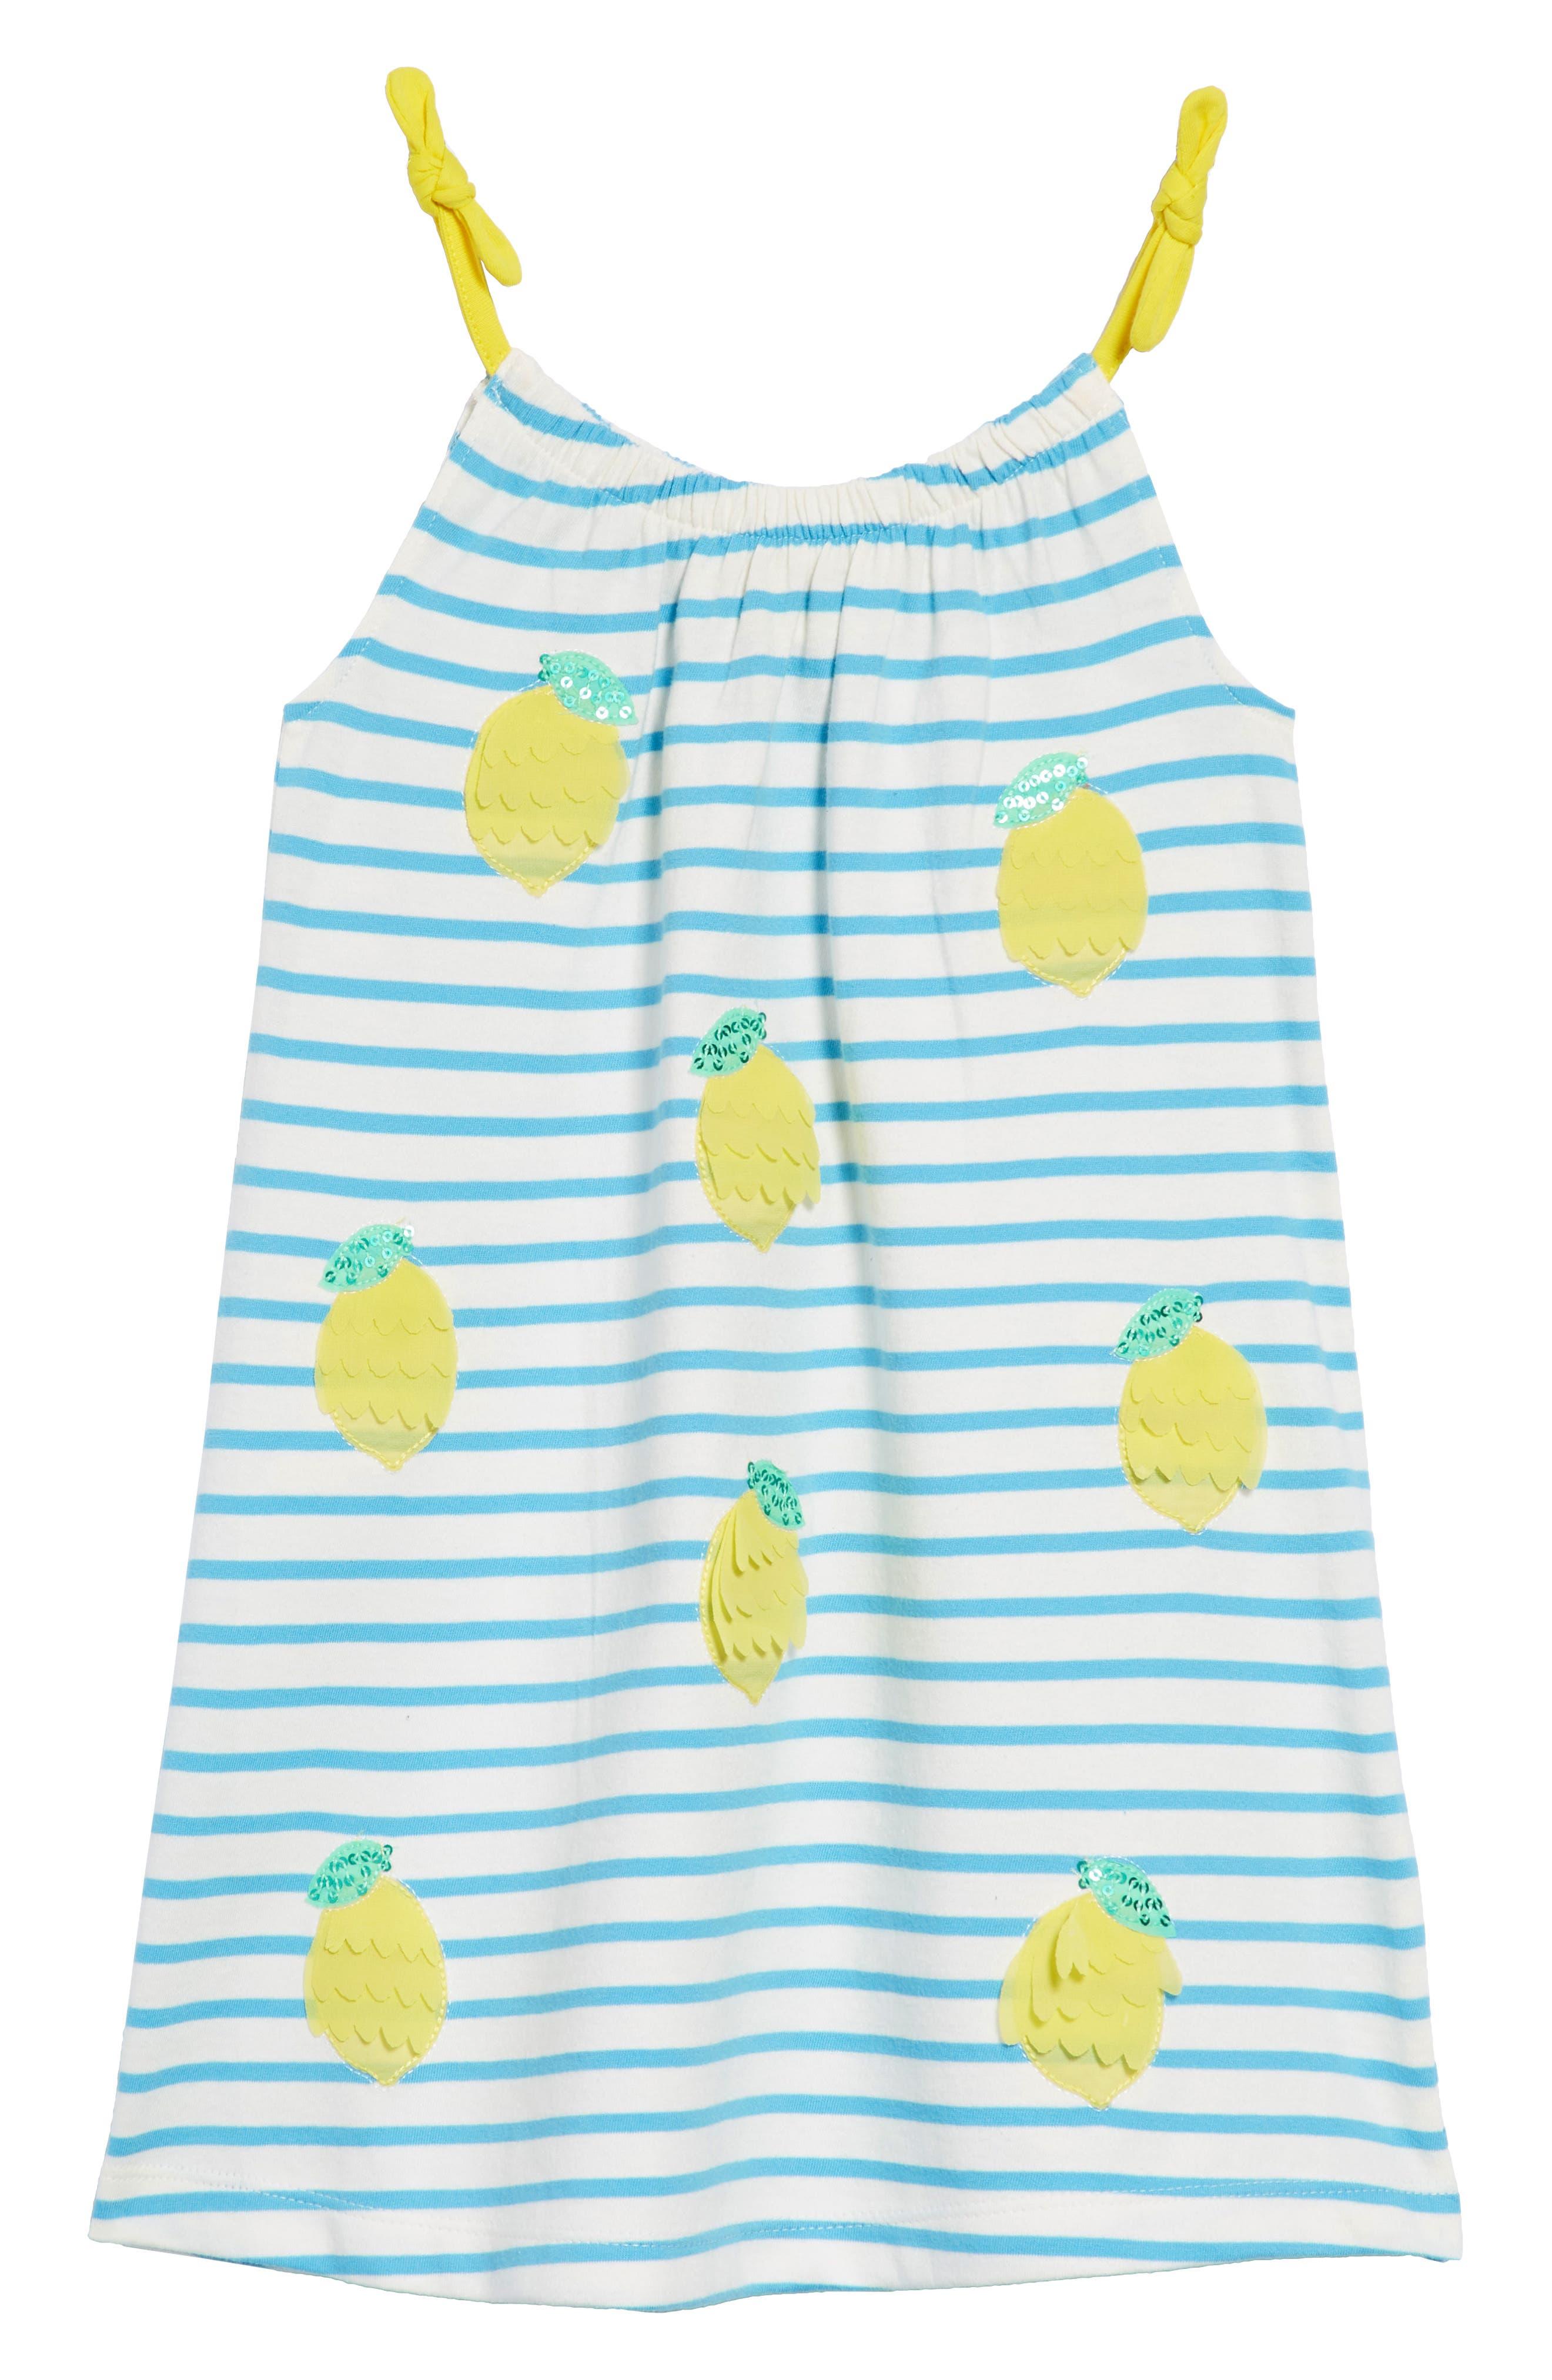 Jersey Sequin Sundress,                             Main thumbnail 1, color,                             Ivory/ Penzance Blue Nav